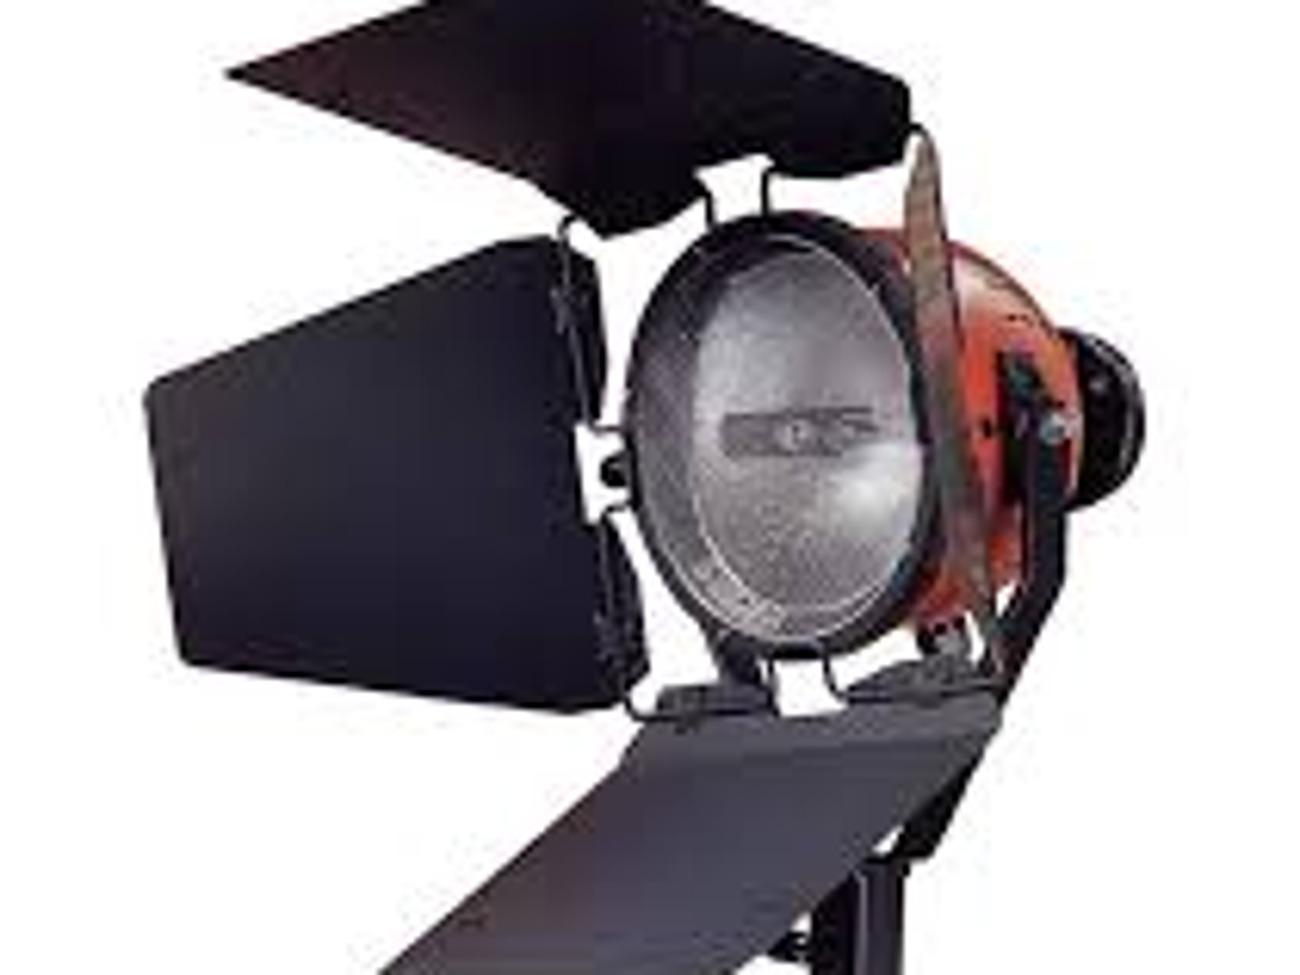 800 Watt Ianiro Red Head Video Light